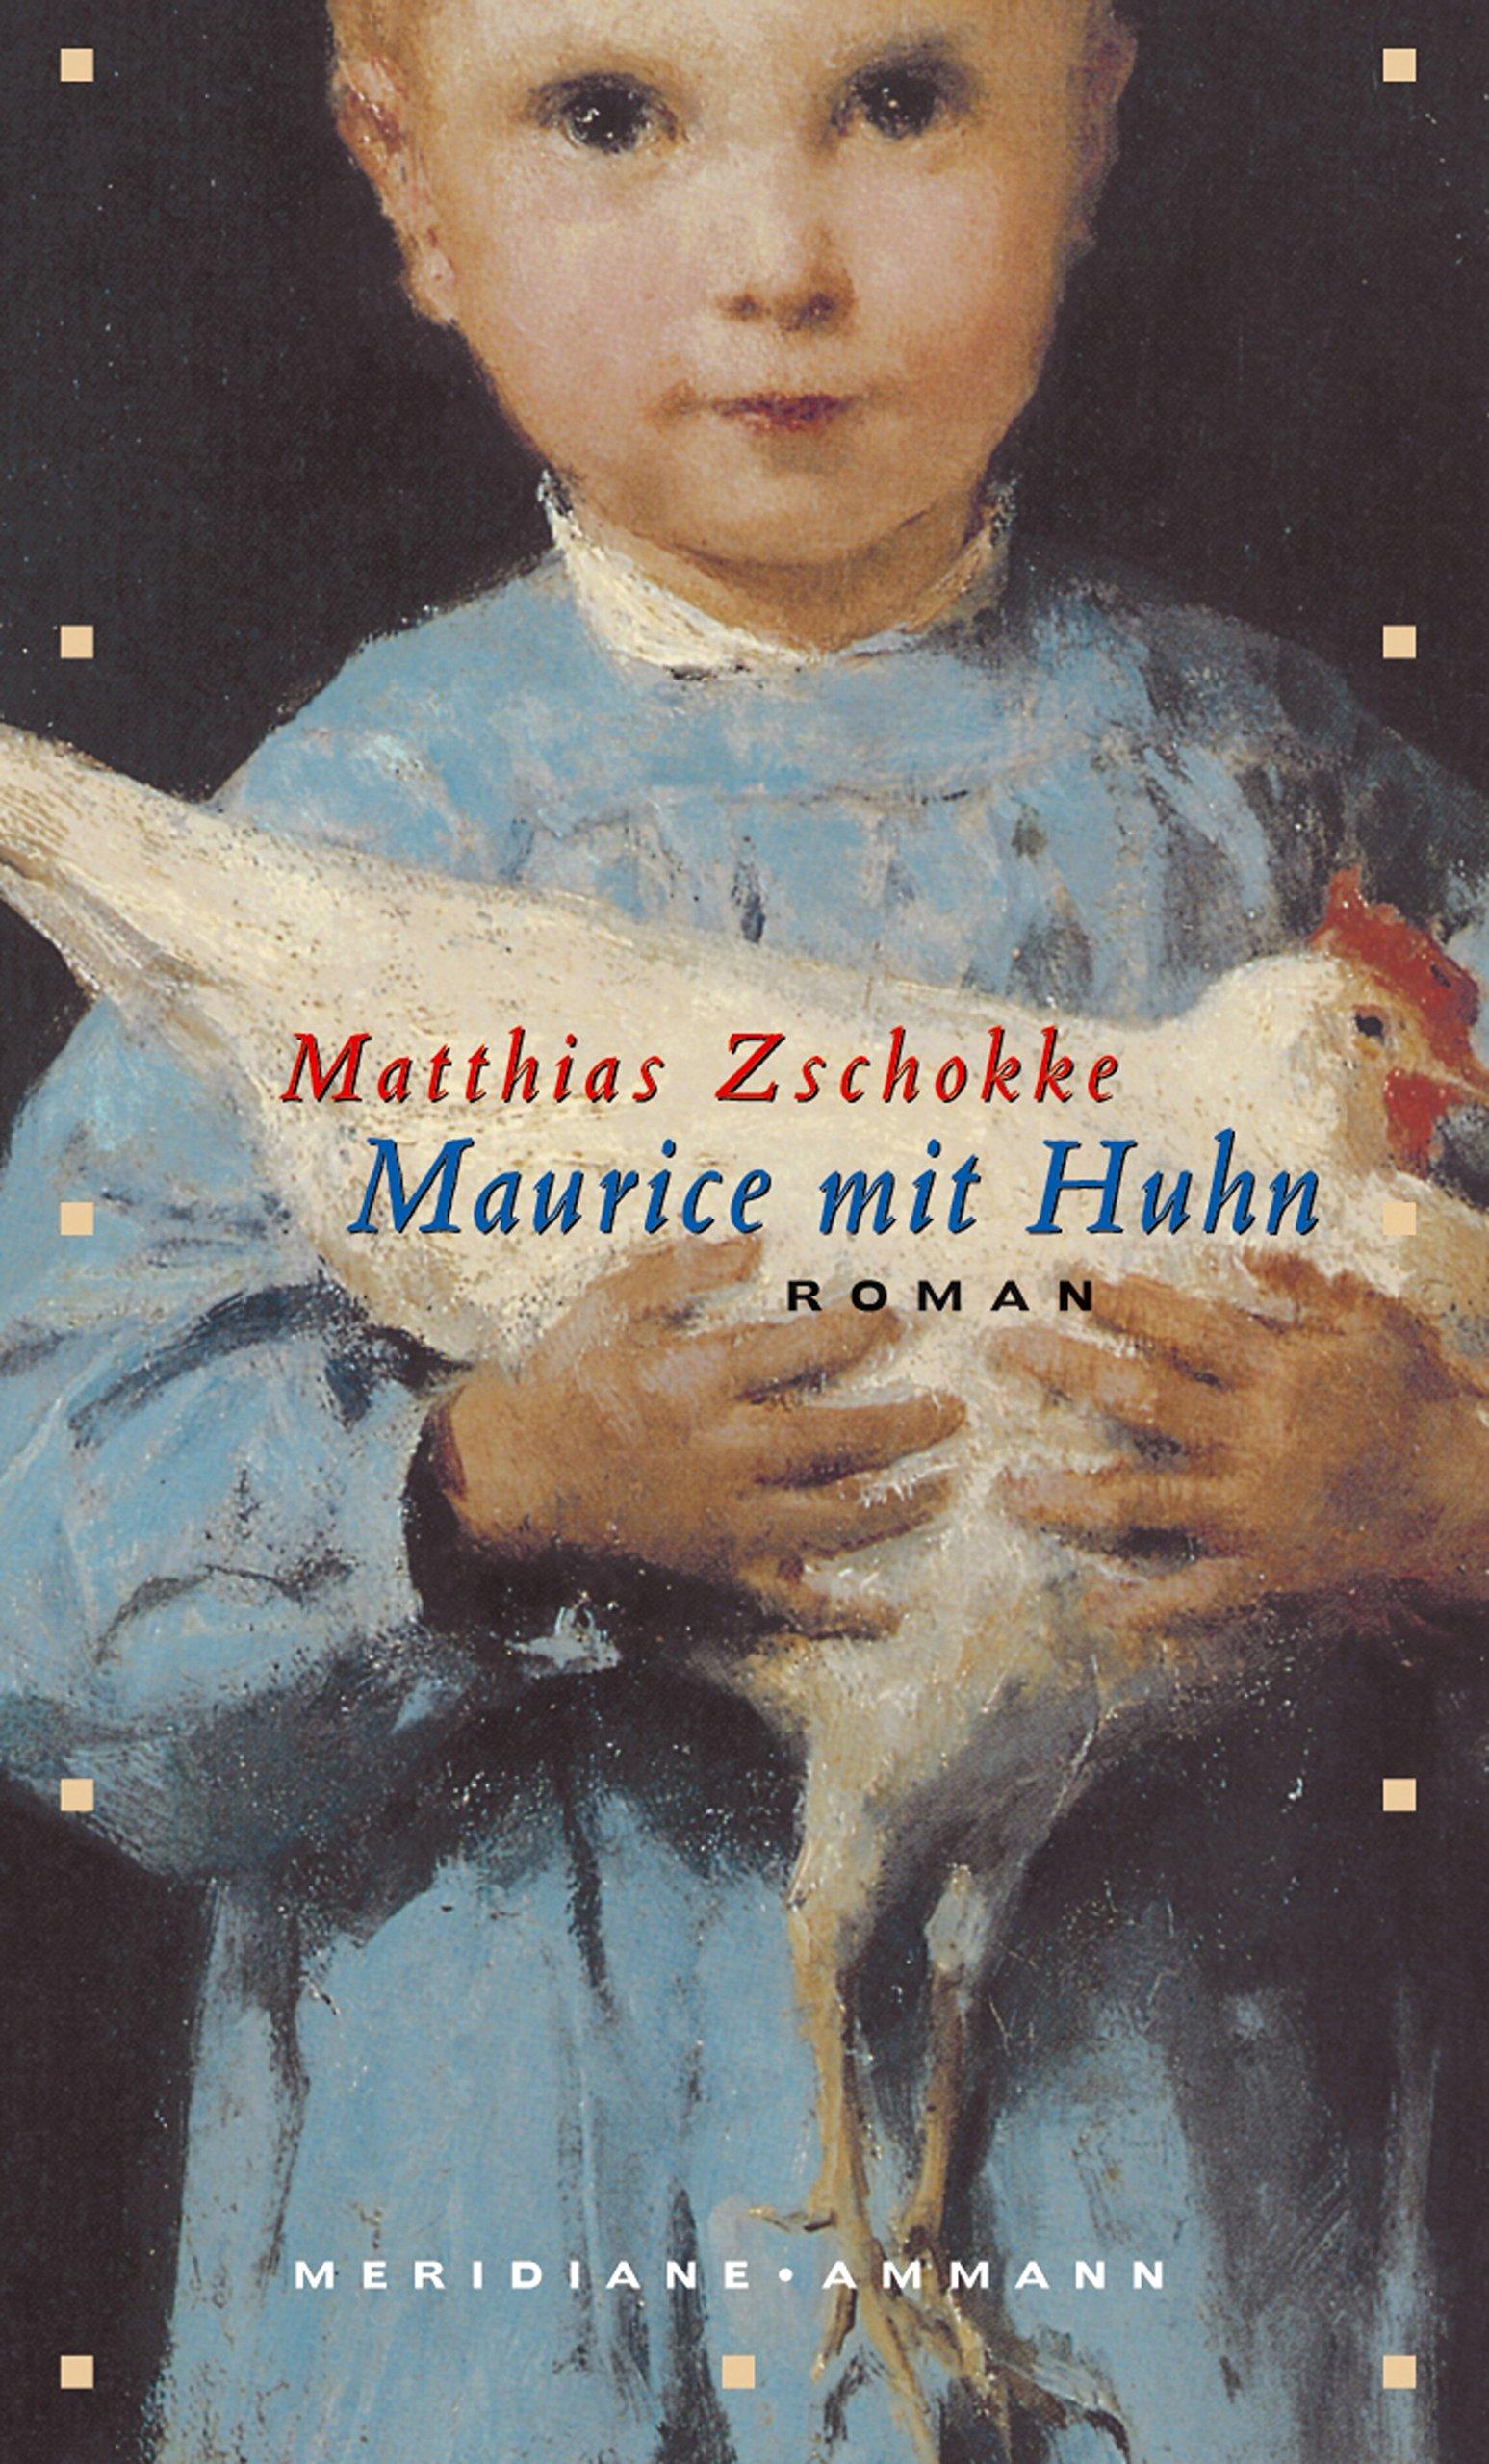 Maurice mit Huhn: Roman